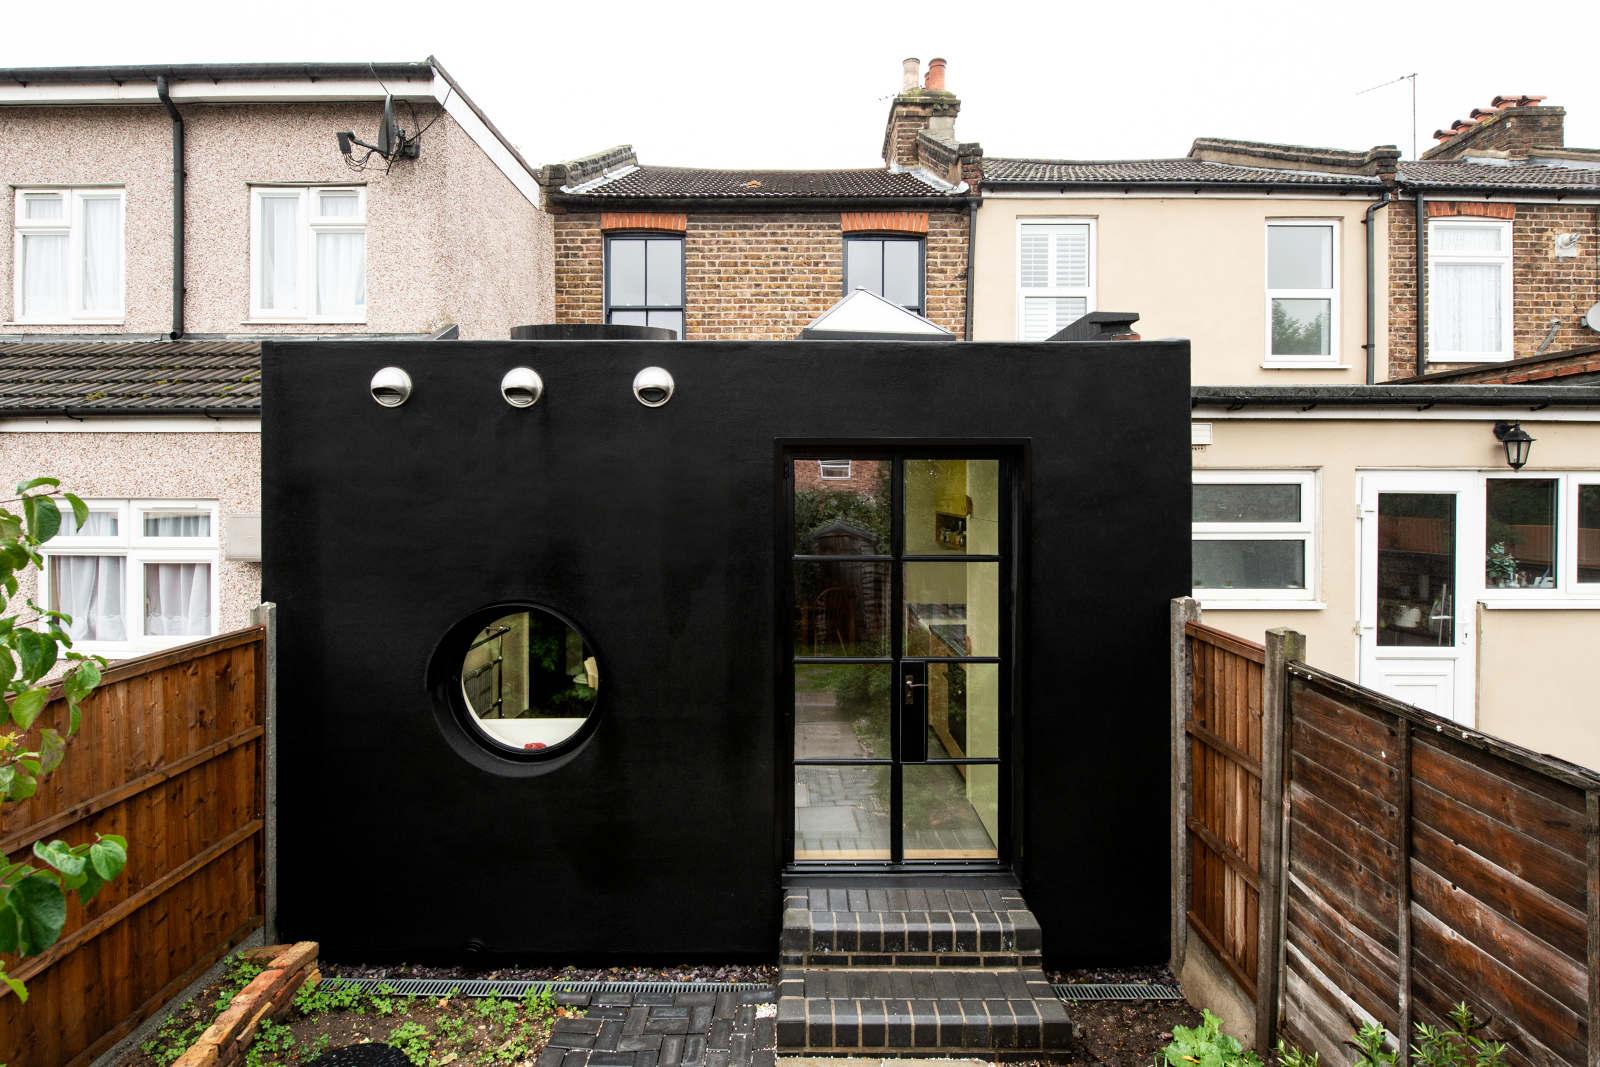 Black cube home in backyard